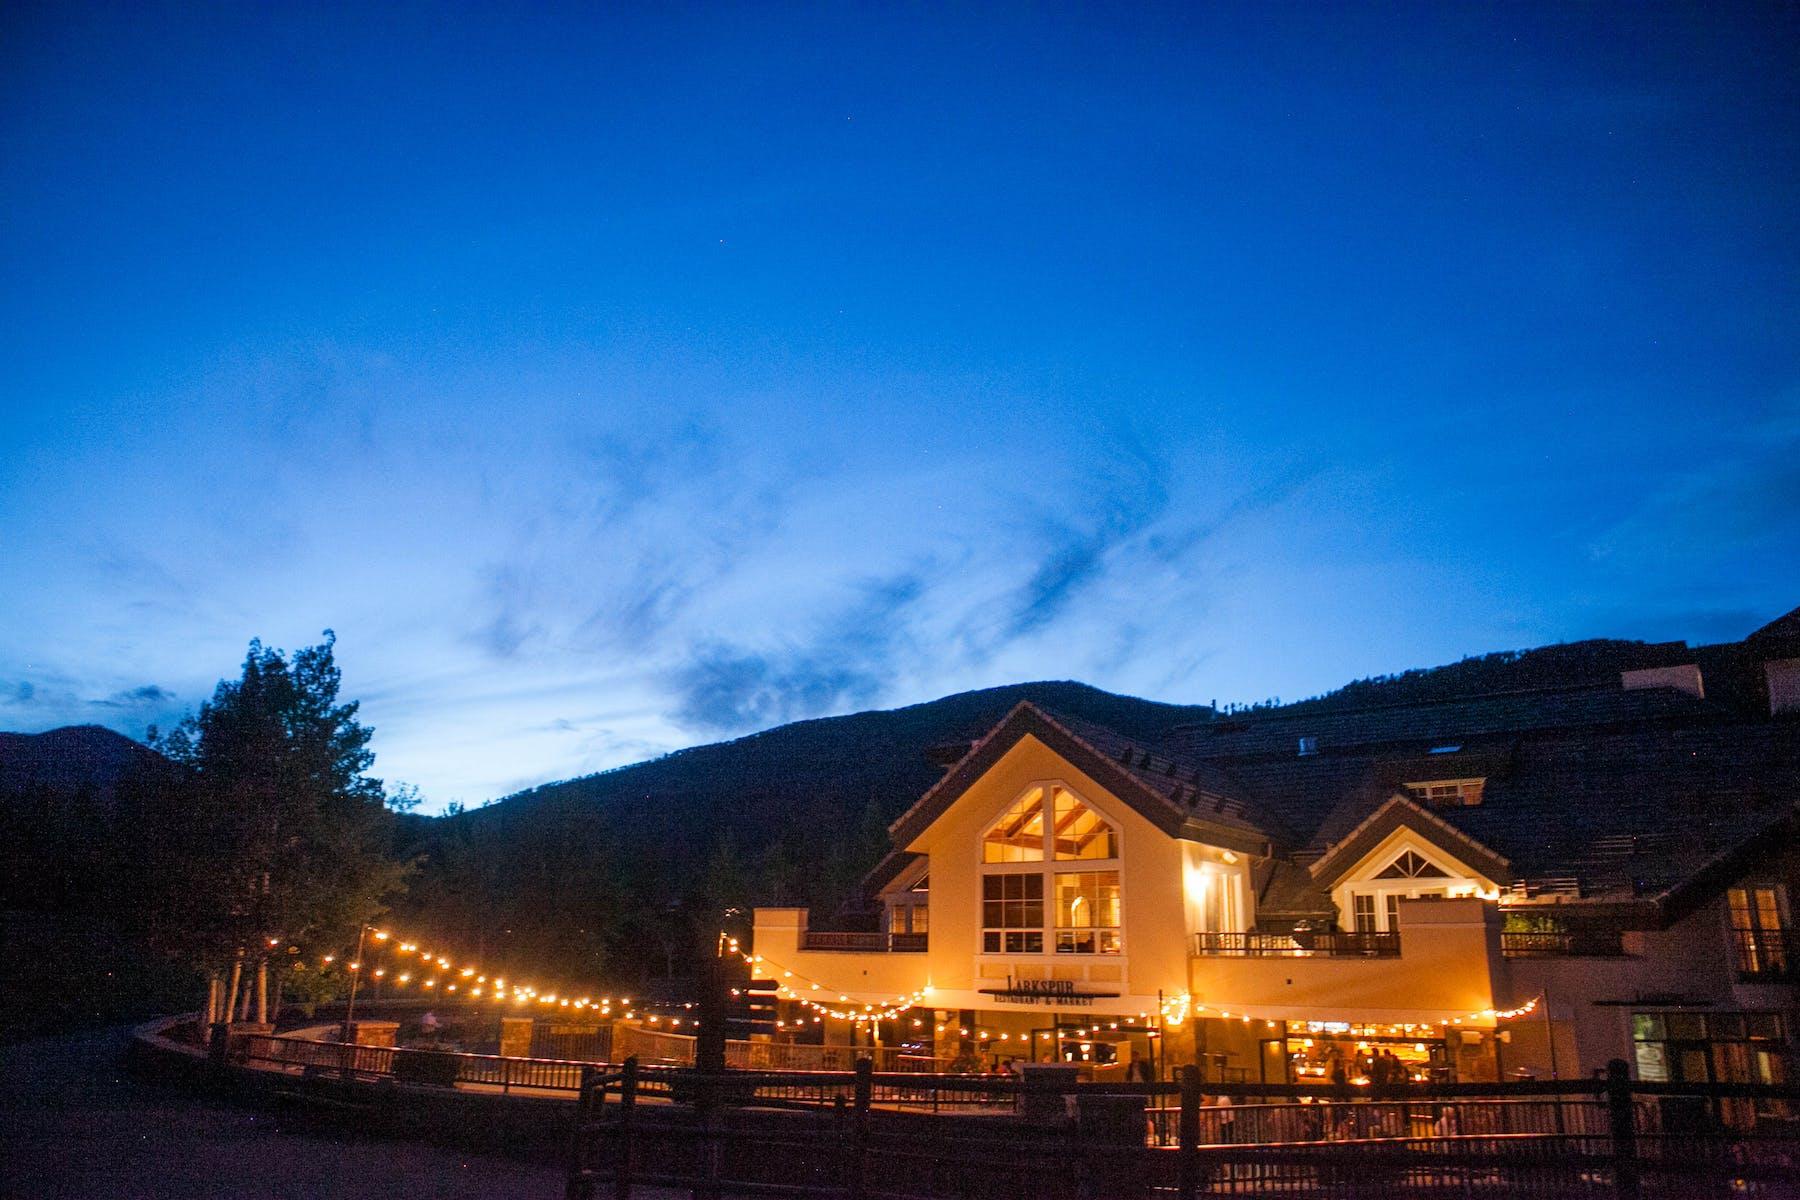 Larkspur Restaurant Events Weddings Vail Colorado Mountainside Patio Deck